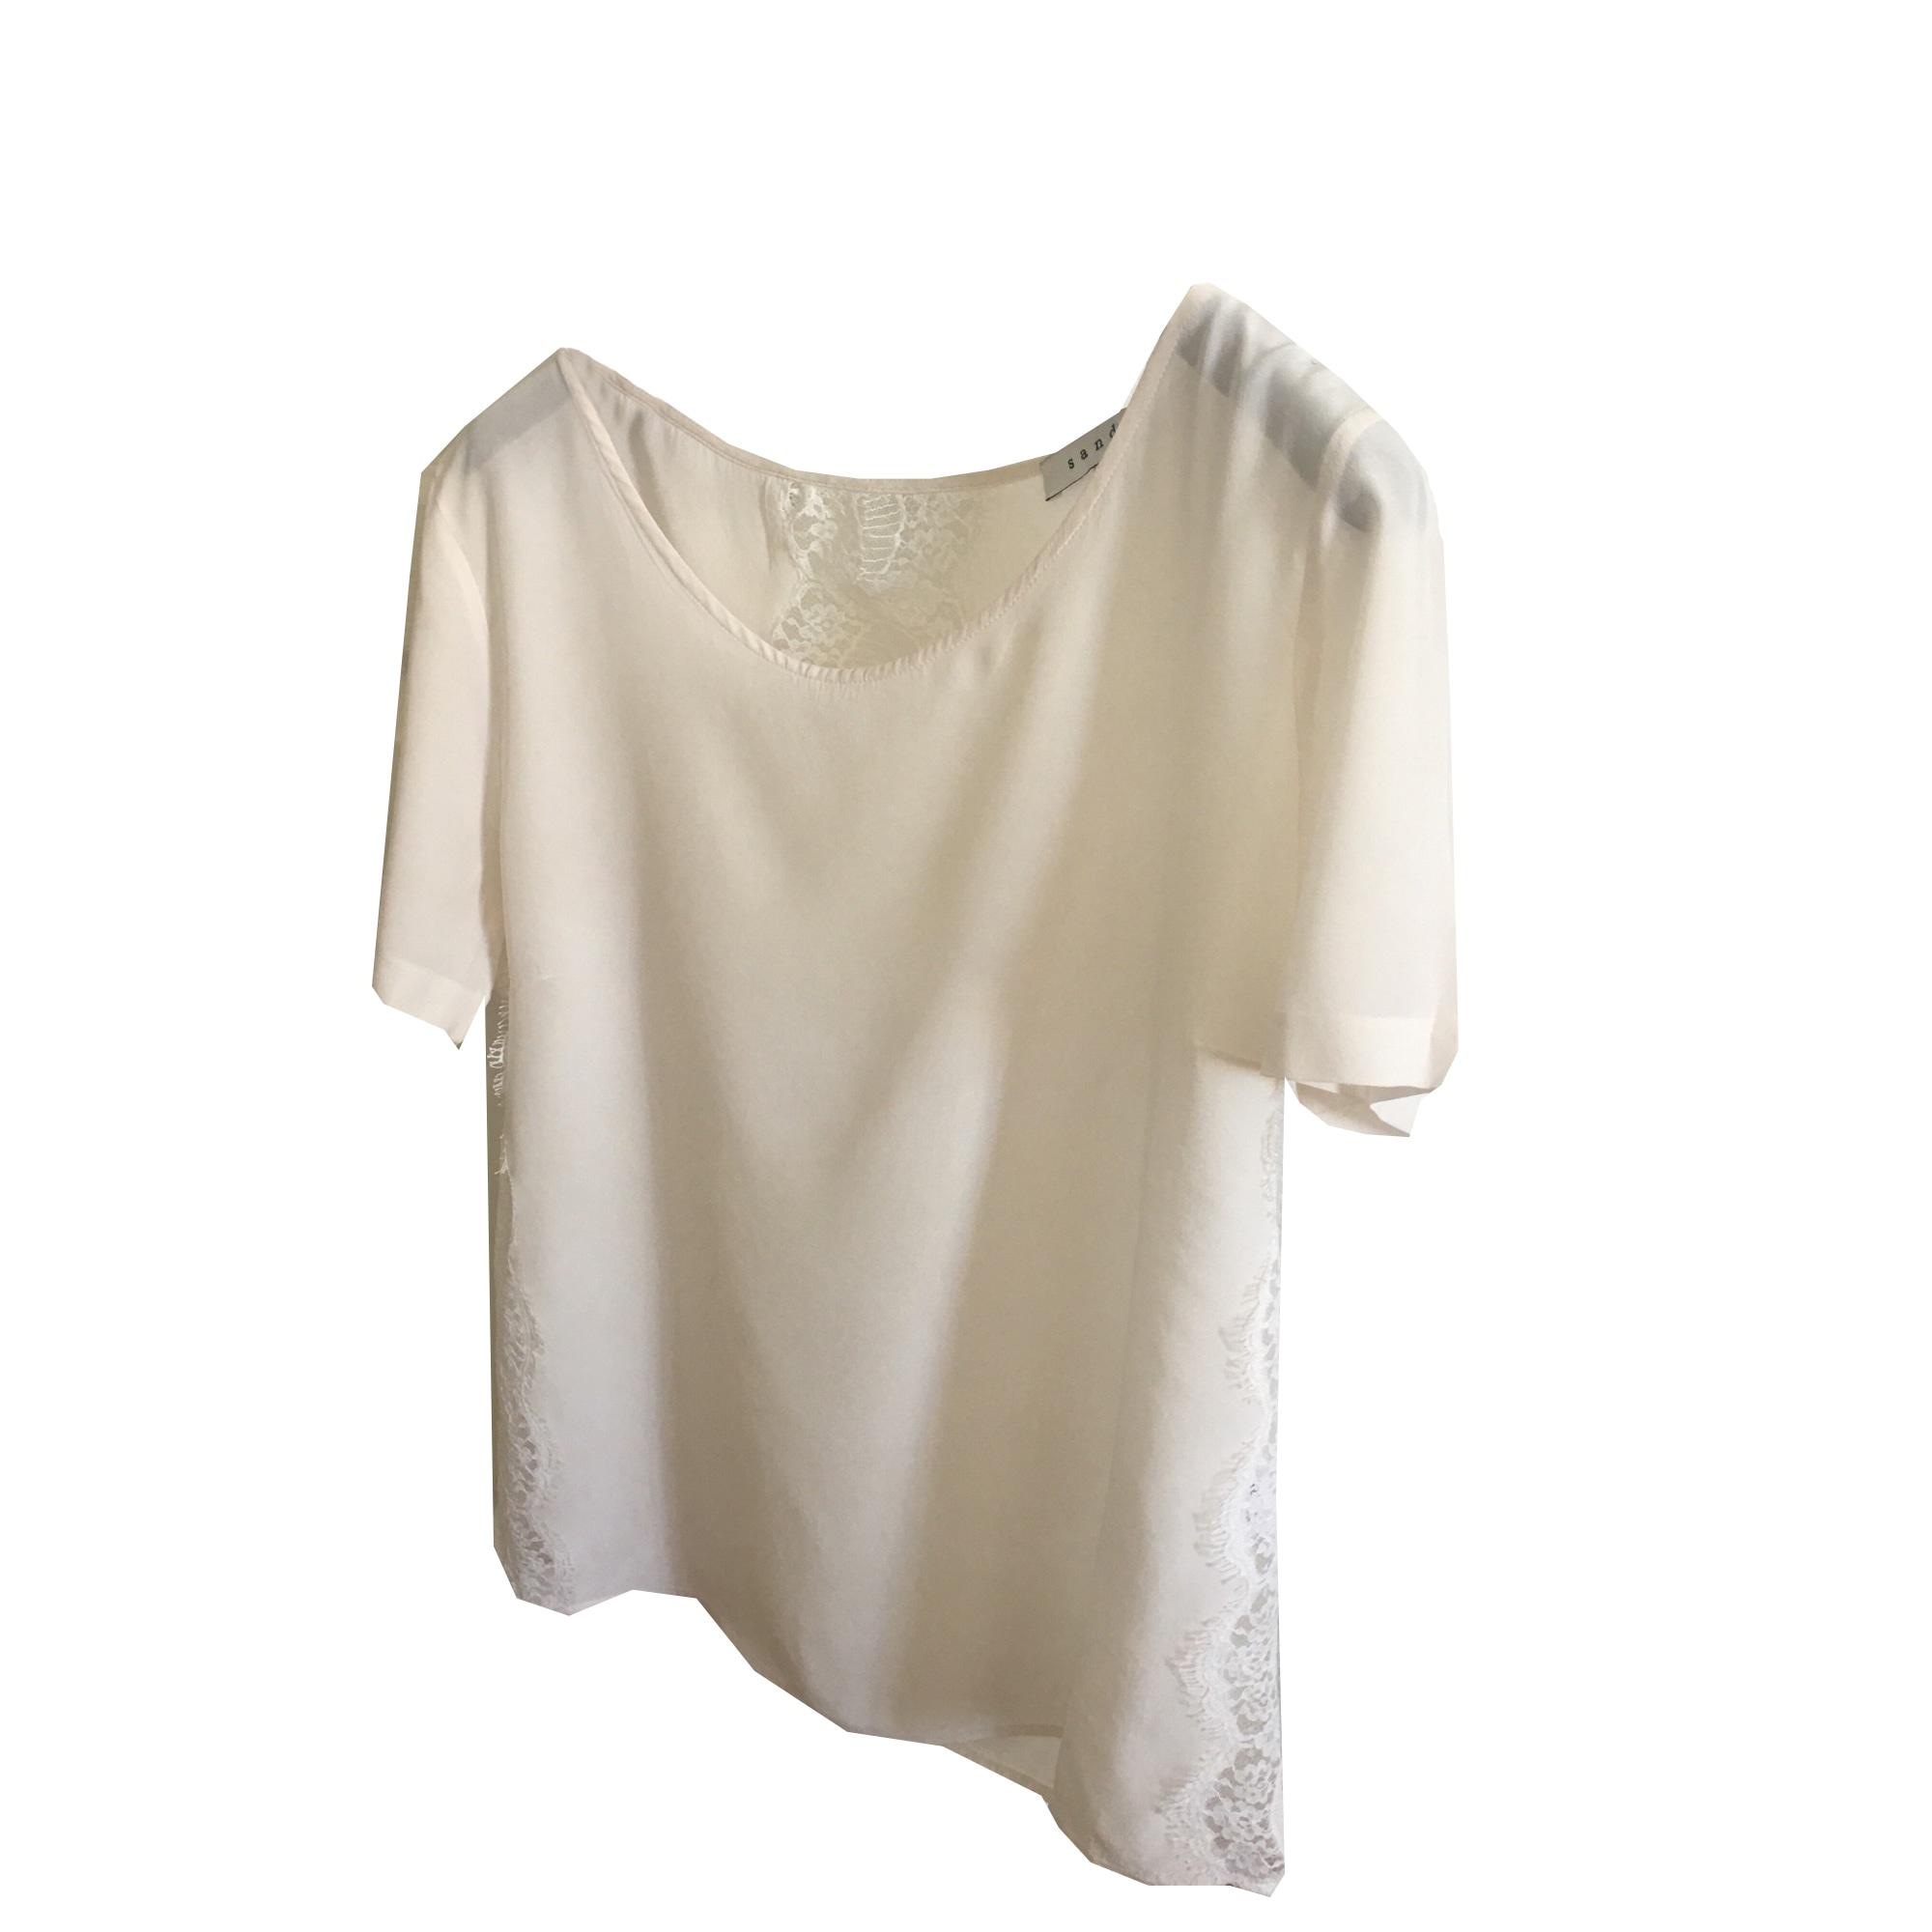 Blouse SANDRO White, off-white, ecru